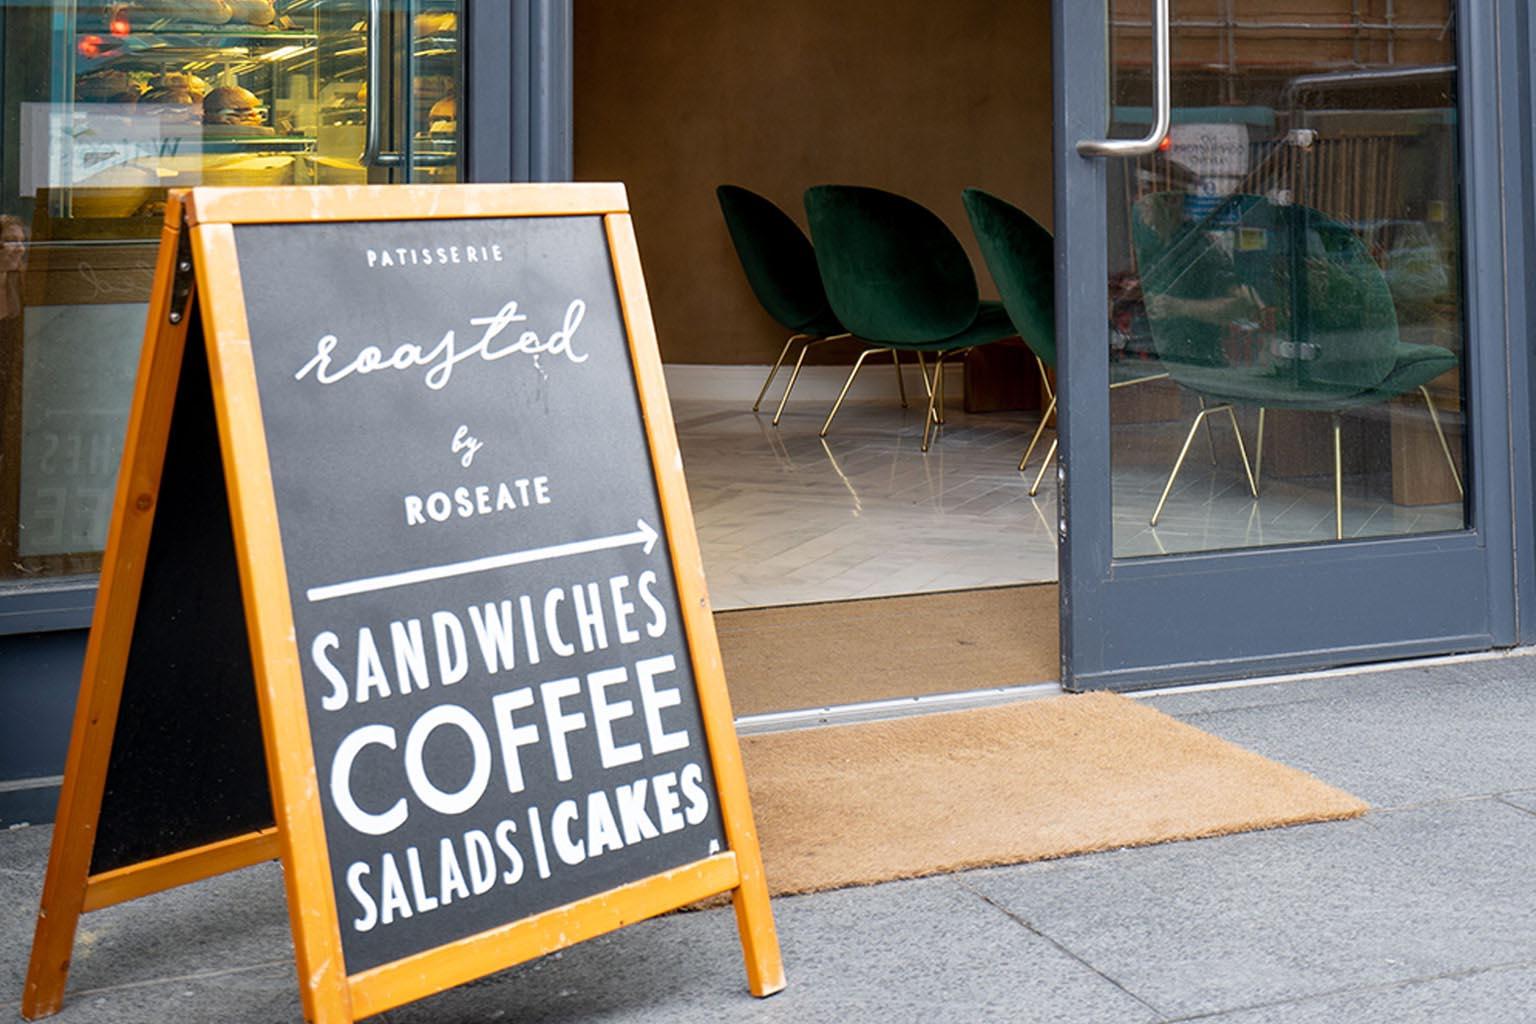 Sandwiches Breakfast & Coffee in The Roseate Hotel Reading